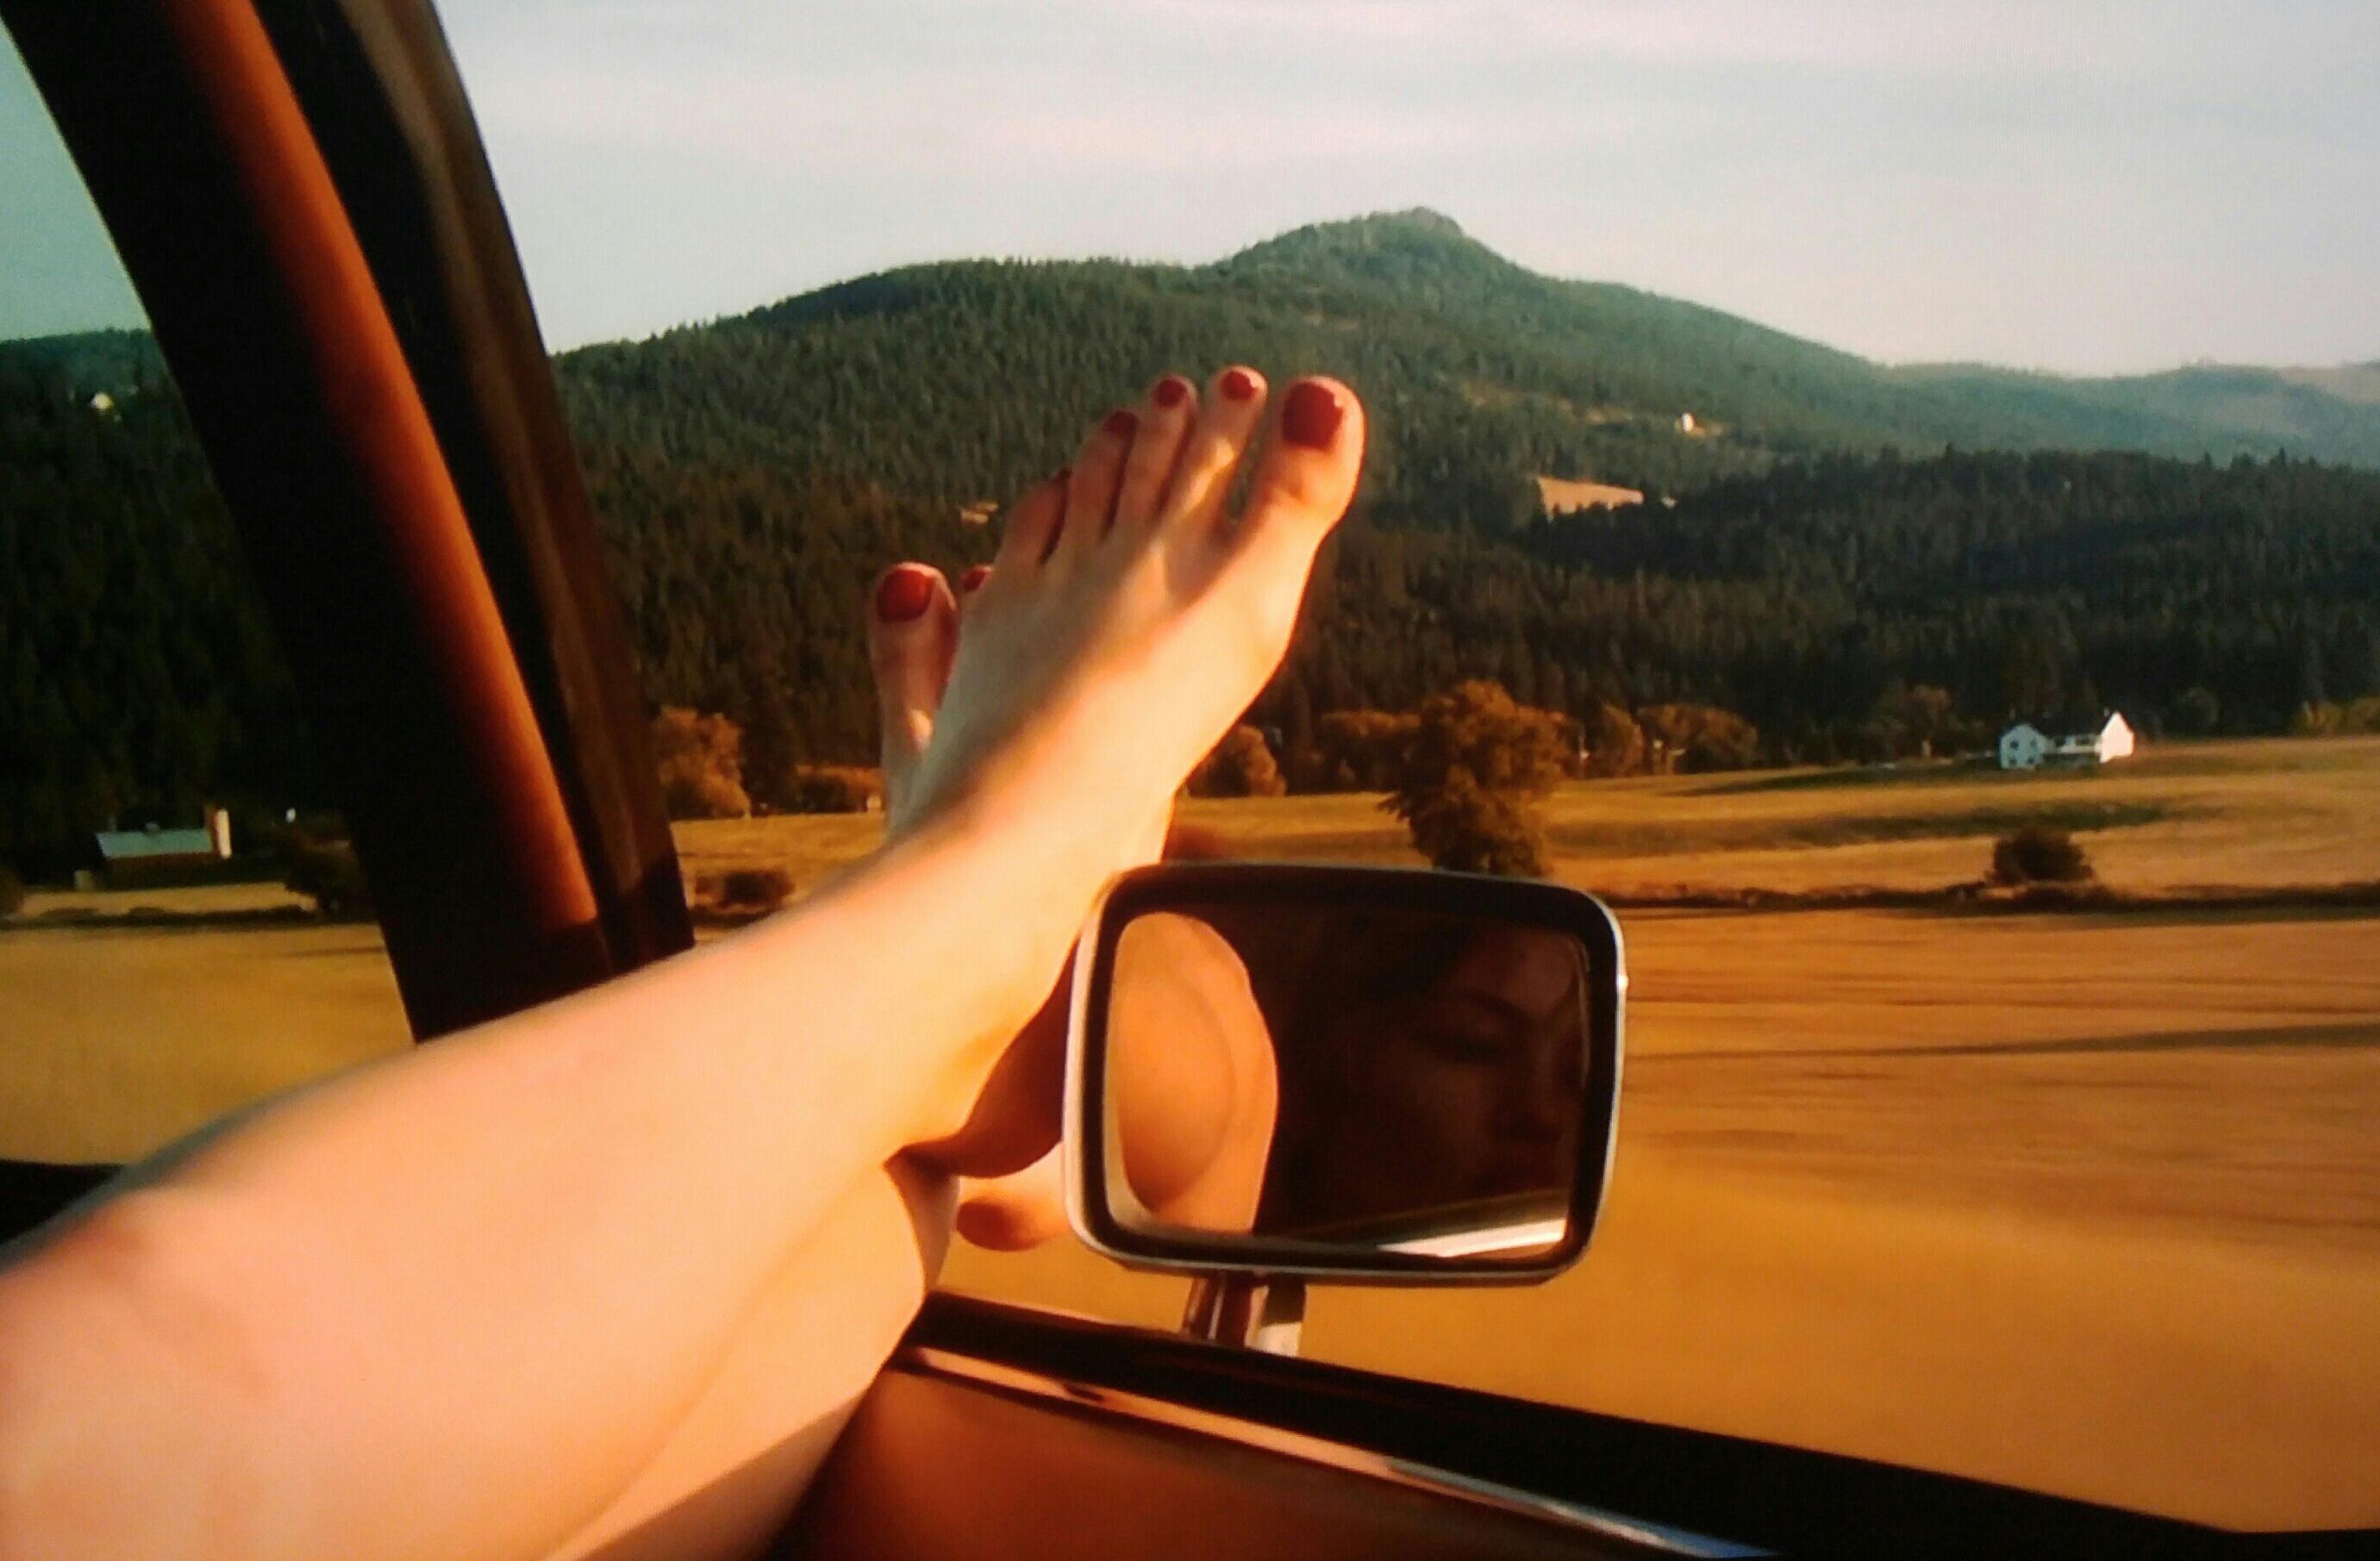 https://pics.wikifeet.com/Daveigh-Chase-Feet-2979792.jpg